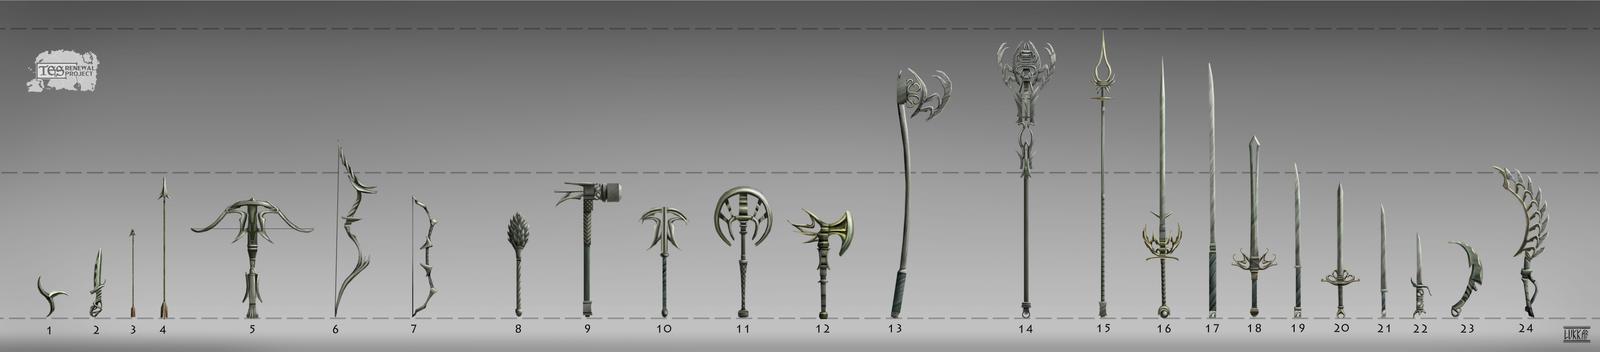 Admantium weapons set by lukkar